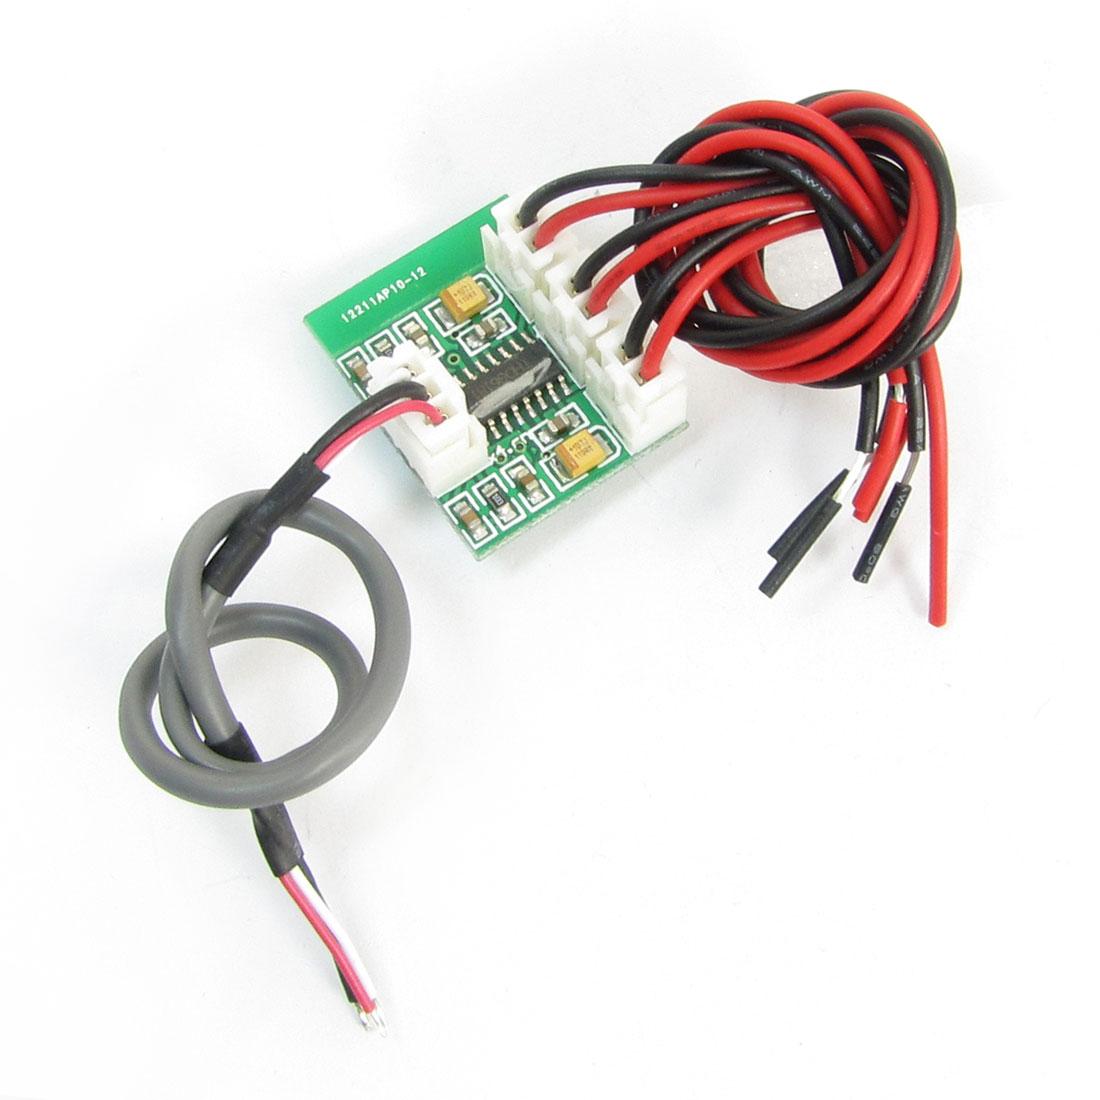 Super Mini 3W+3W Dual Track Digital Amplifier Board 3.6-5.5V USB Power